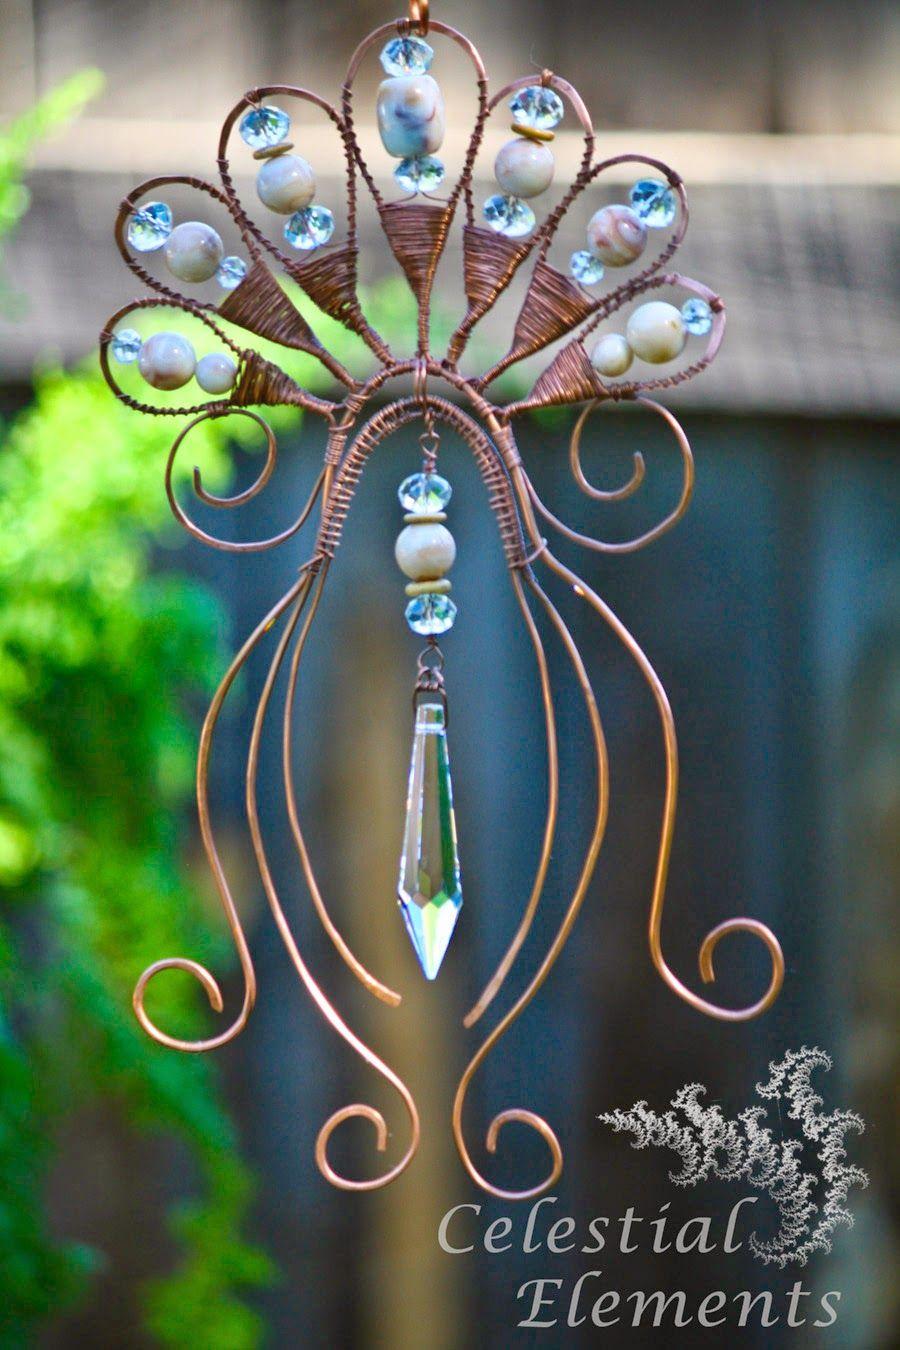 Lotus Elegance A Elegant Handmade Suncatcher With Scrolled Copper Wire It Has A Beautiful Drop Crystal In Center On Sun Catcher Window Art Copper Wire Art